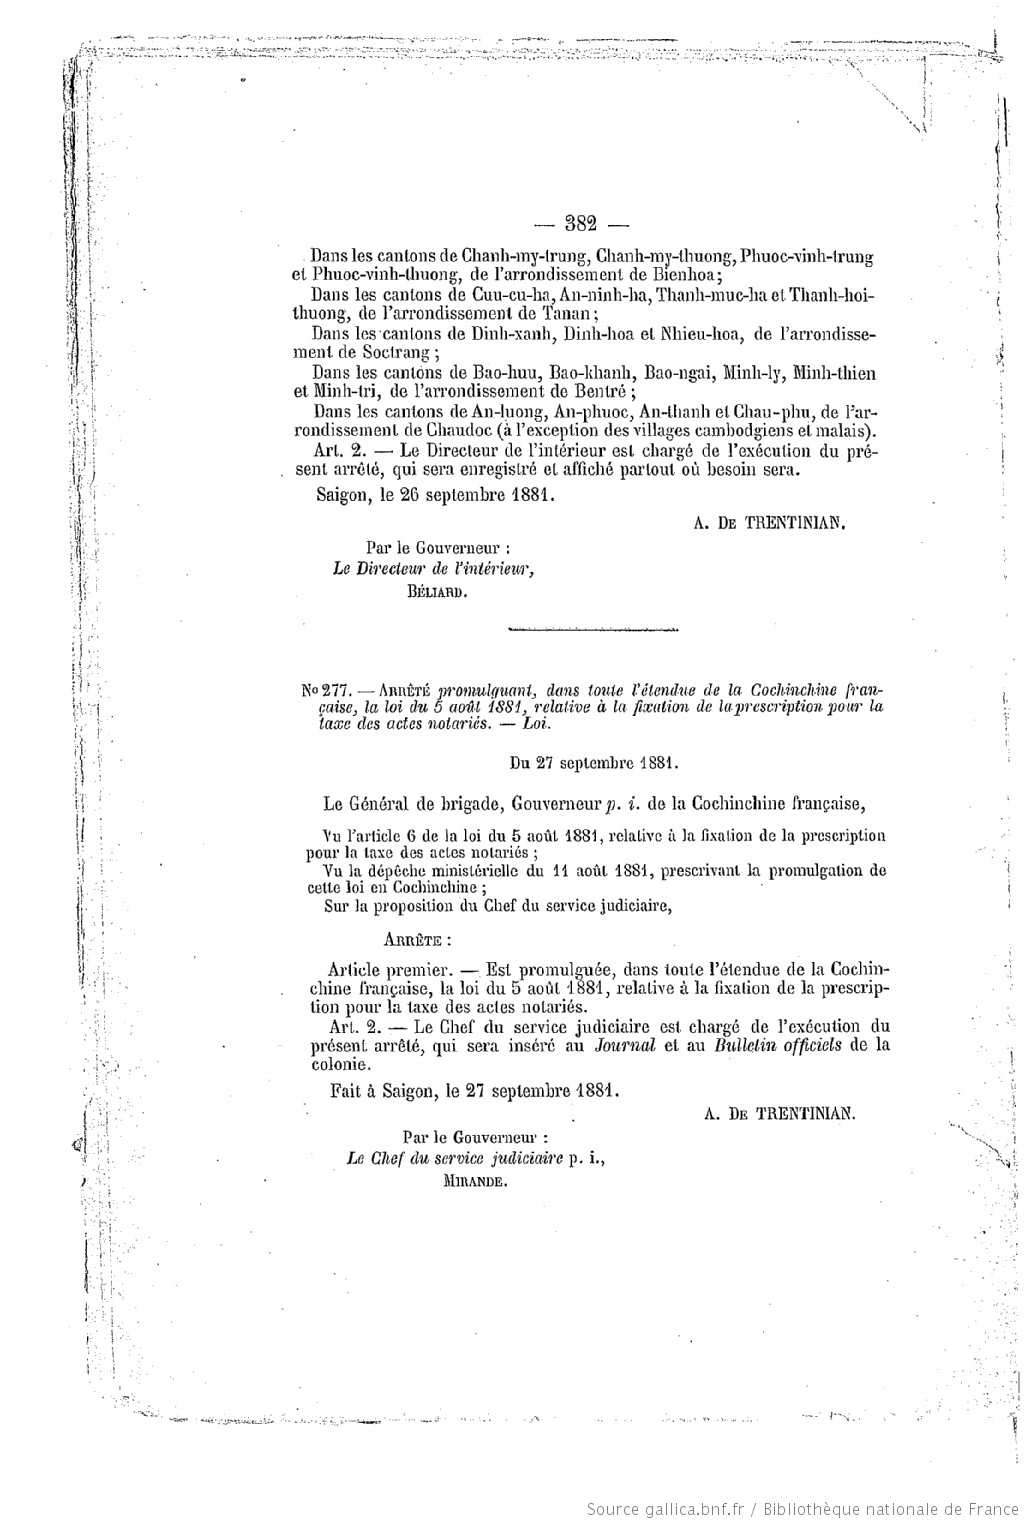 http://gallica.bnf.fr/ark:/12148/bpt6k57701711/f34.highres